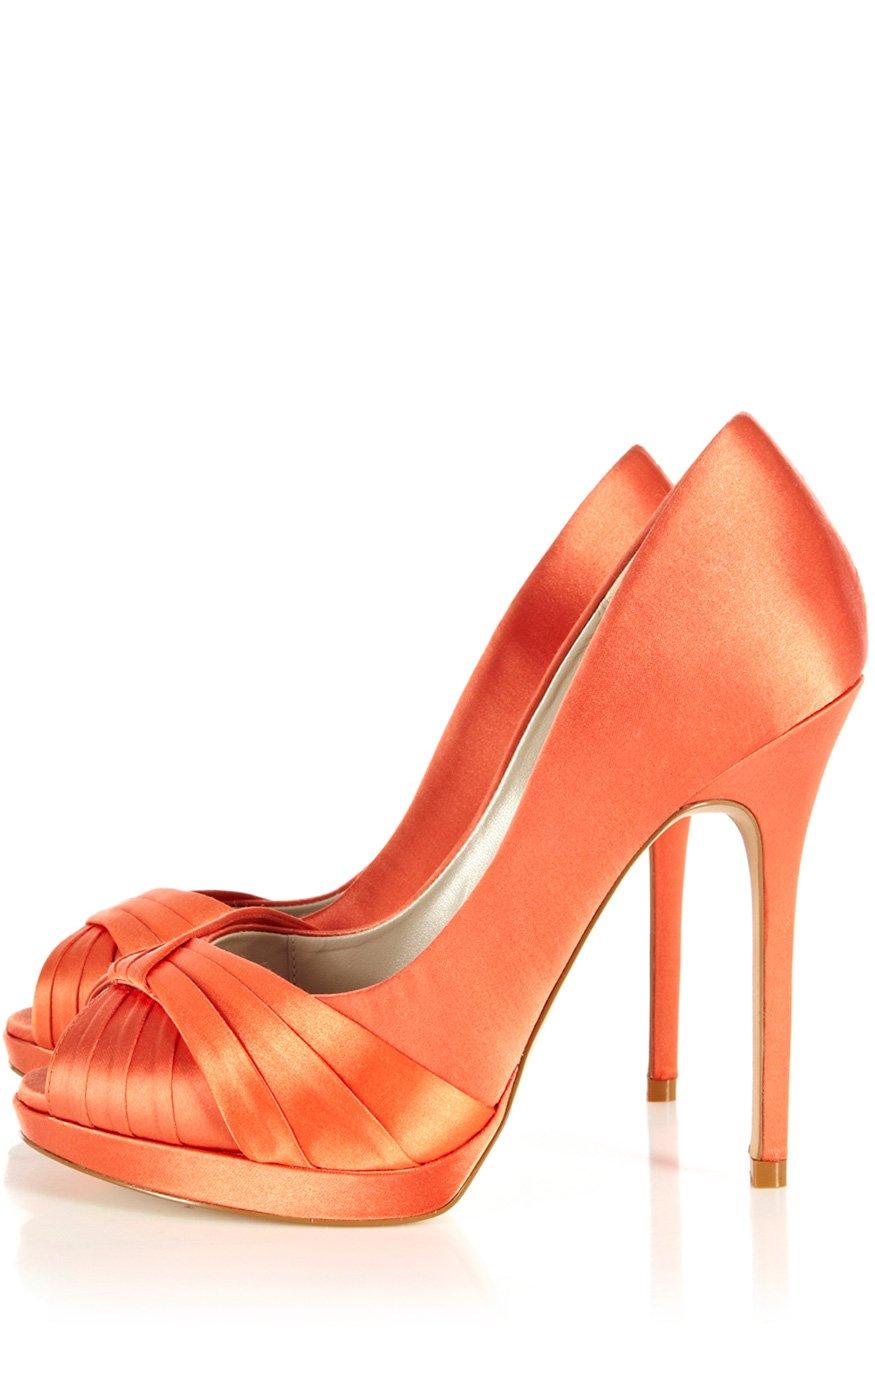 7f893c34ead6 Lyst - Karen Millen Pleated Satin Peep in Orange